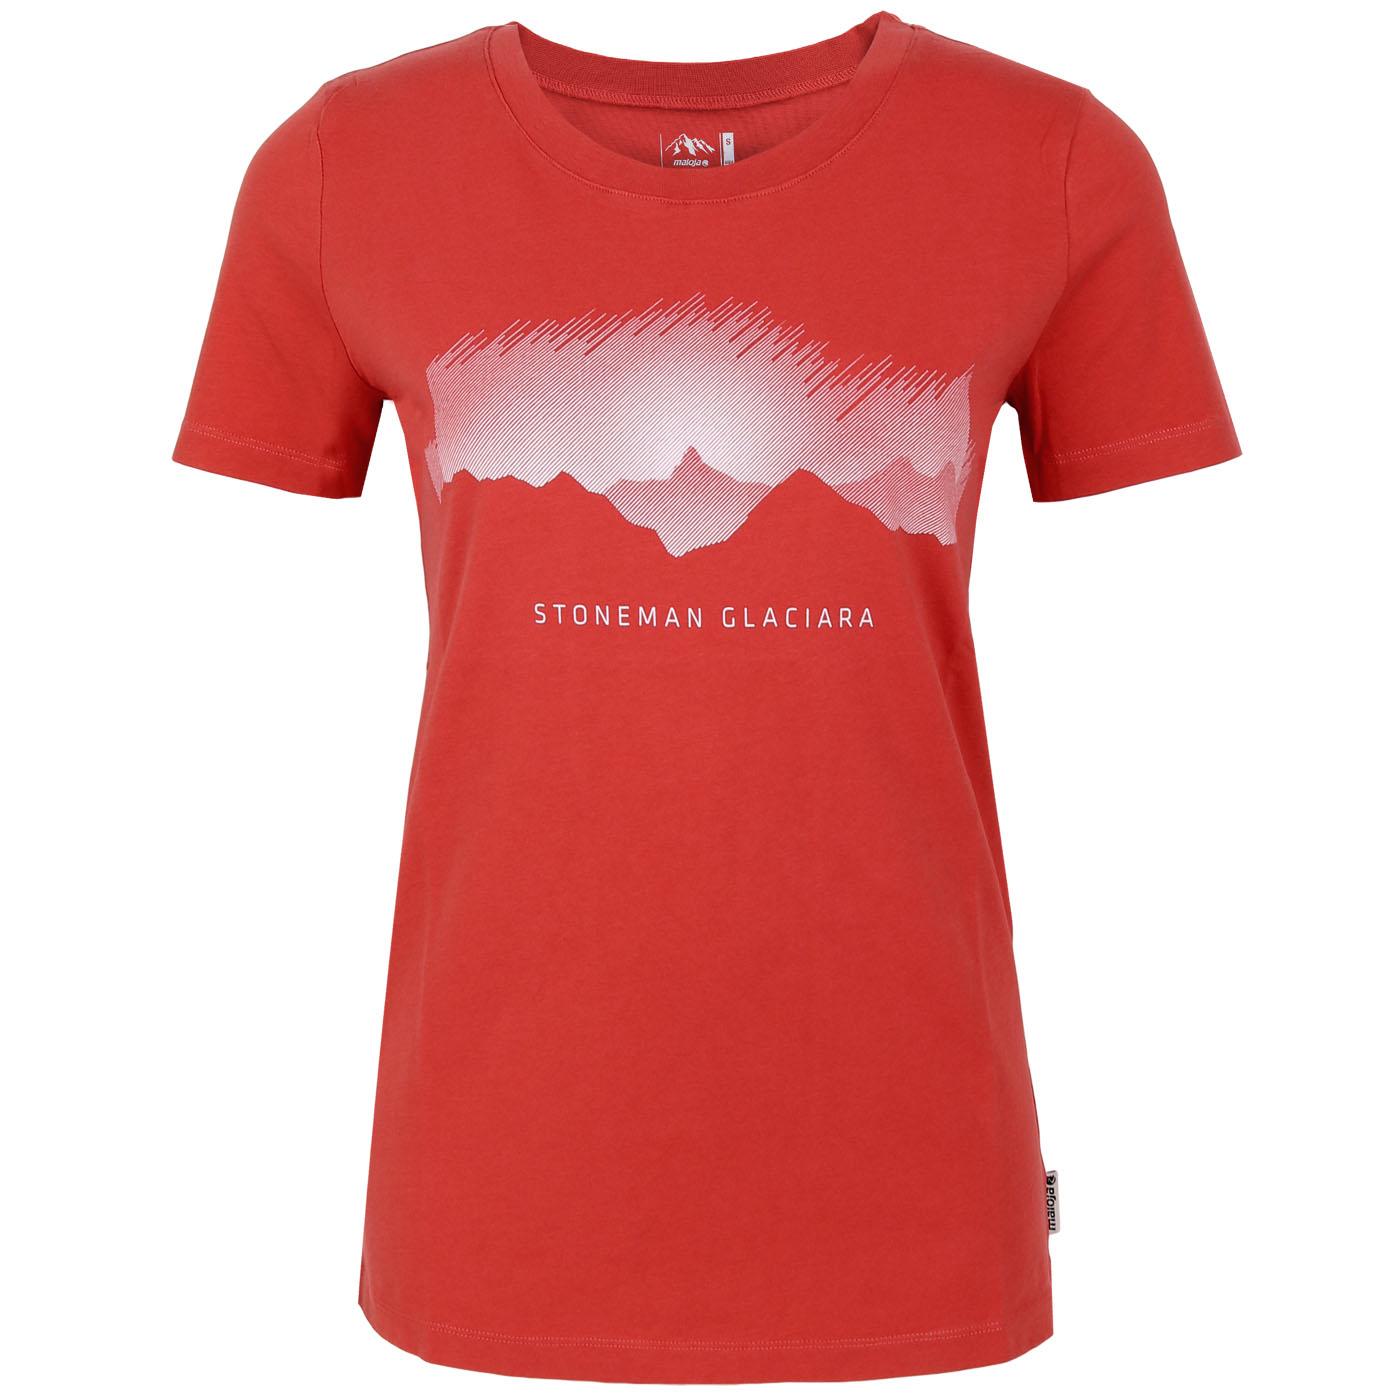 Stoneman Glaciara »Gipfelsturm« Damen T-Shirt by Maloja - vintage red